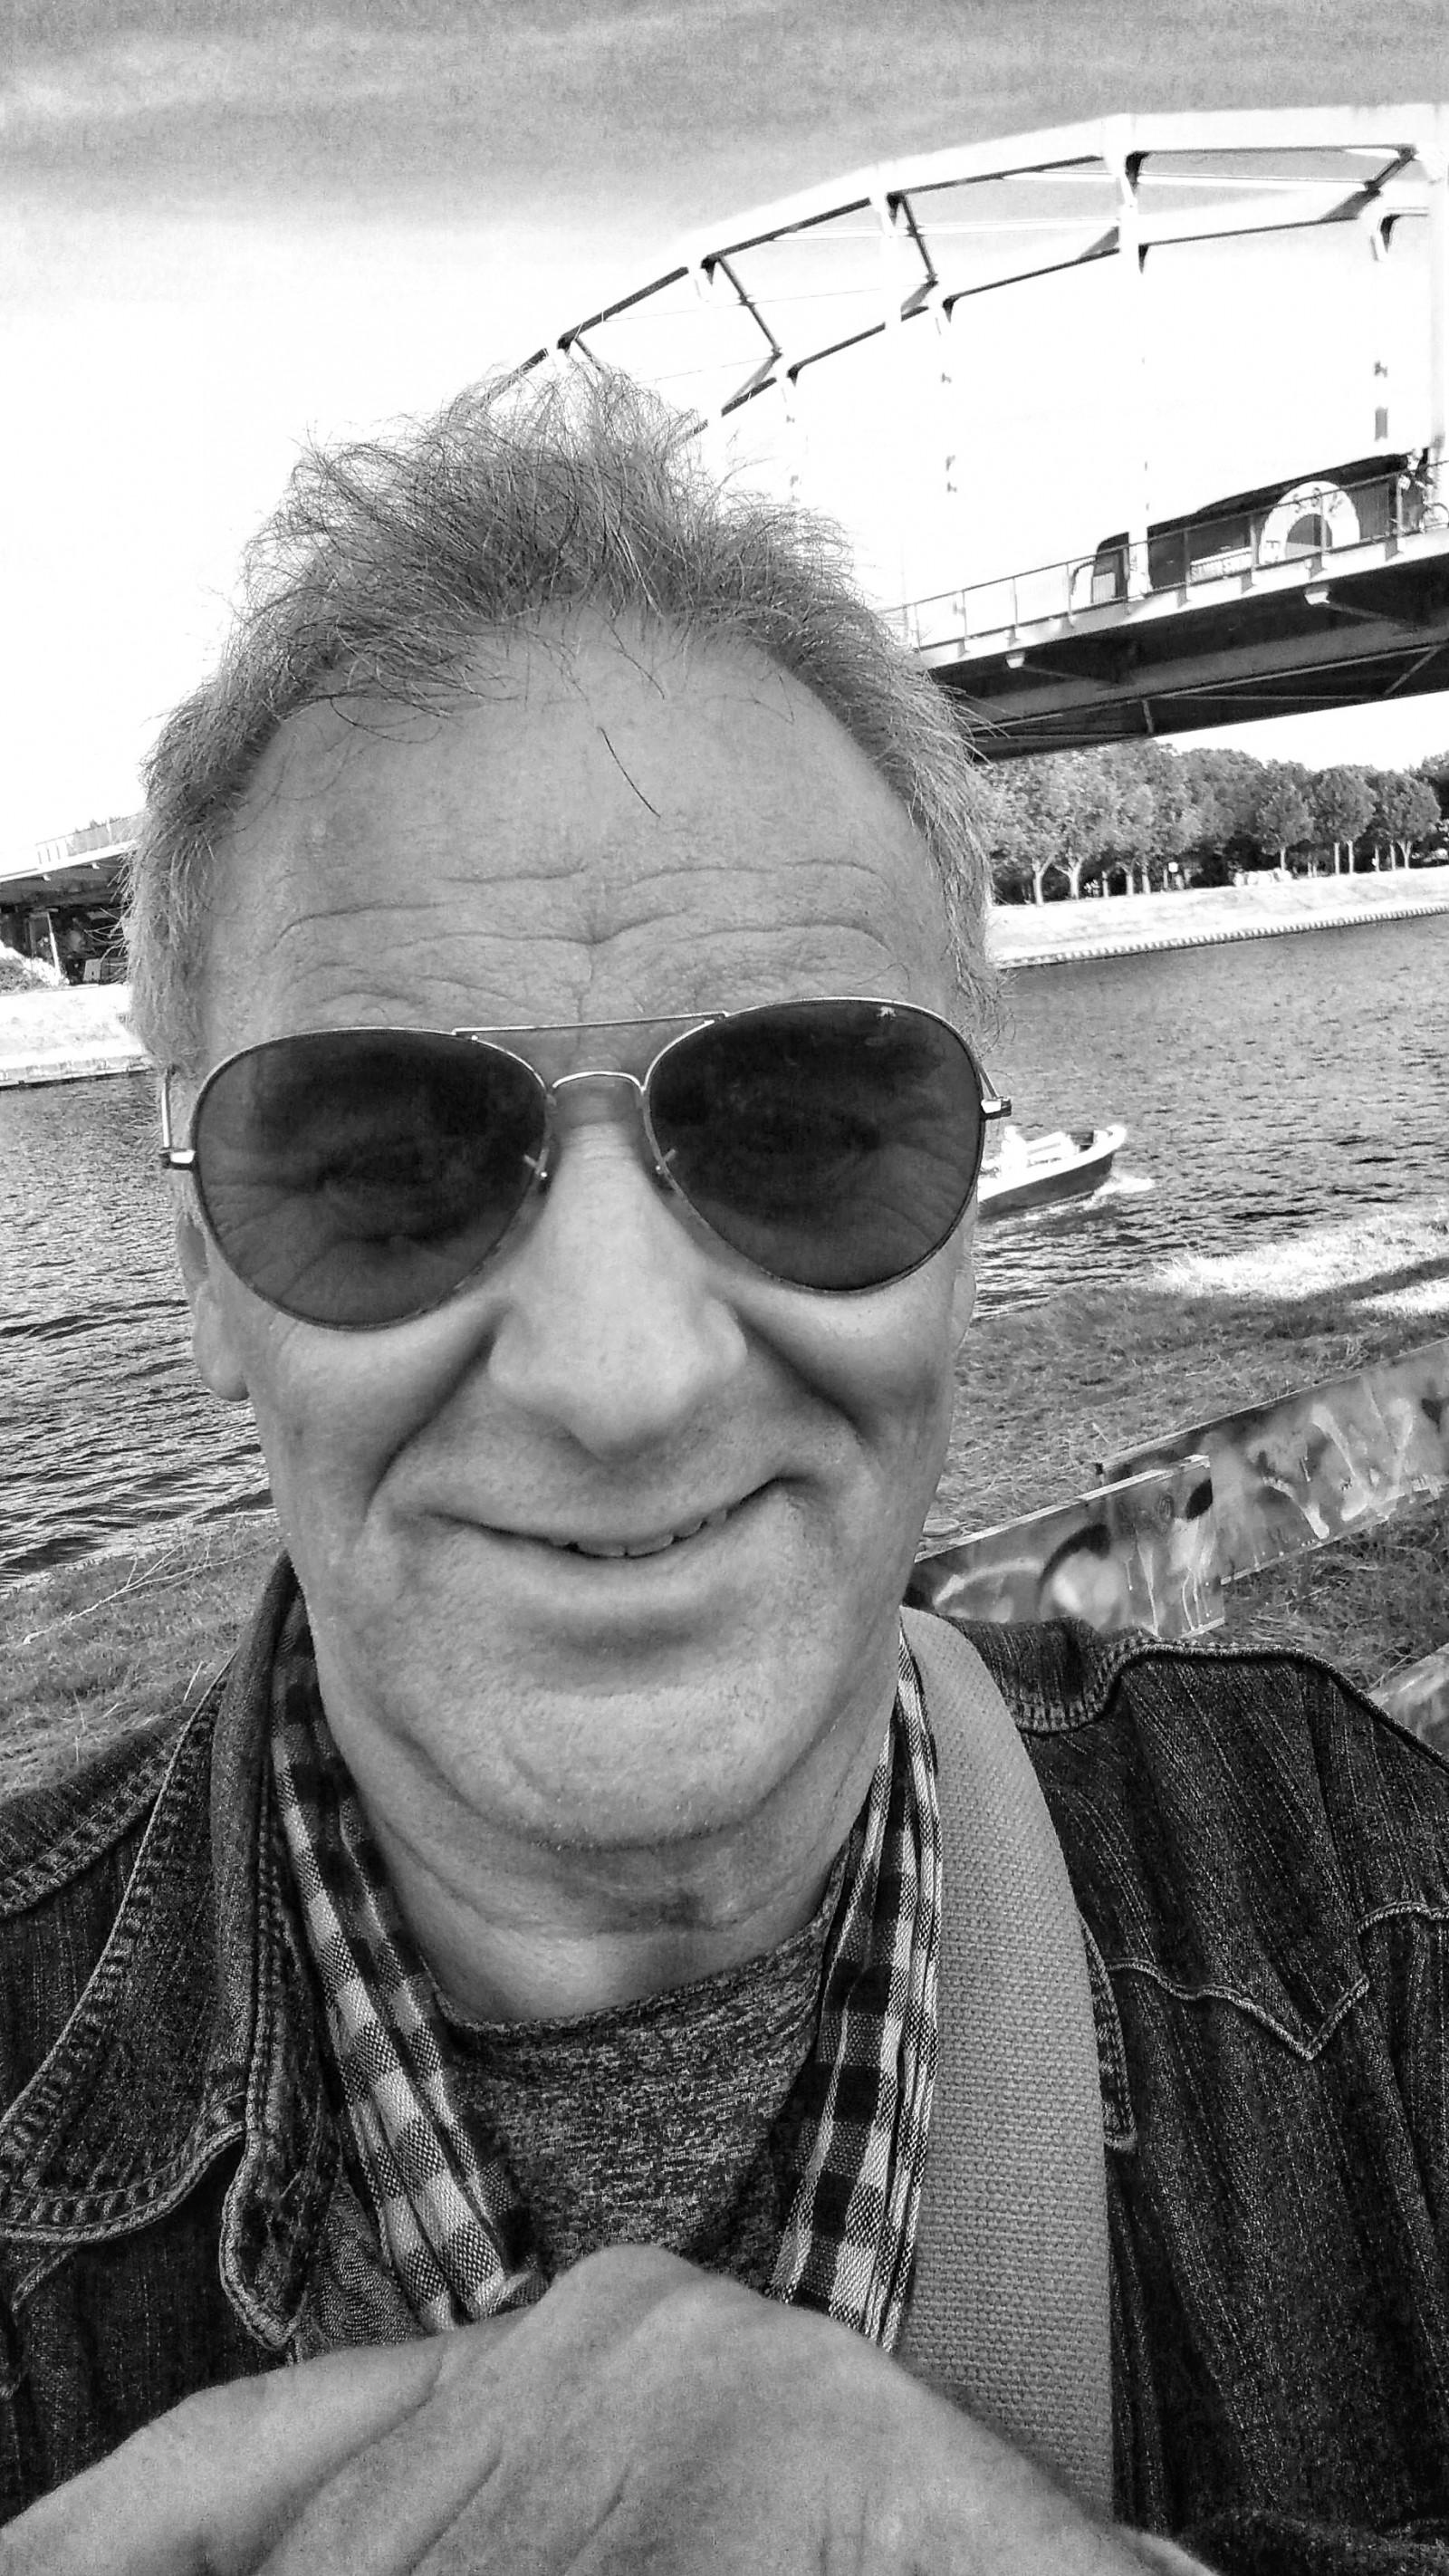 Amsterdam Michael Klinkhamer analog 13pxp selfie